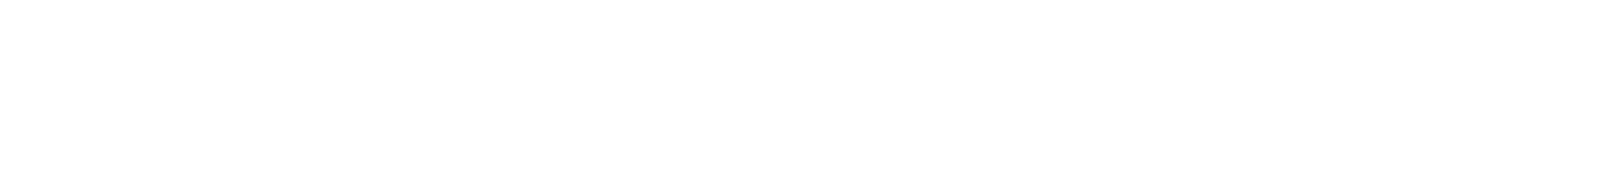 interviews-ninja-logo